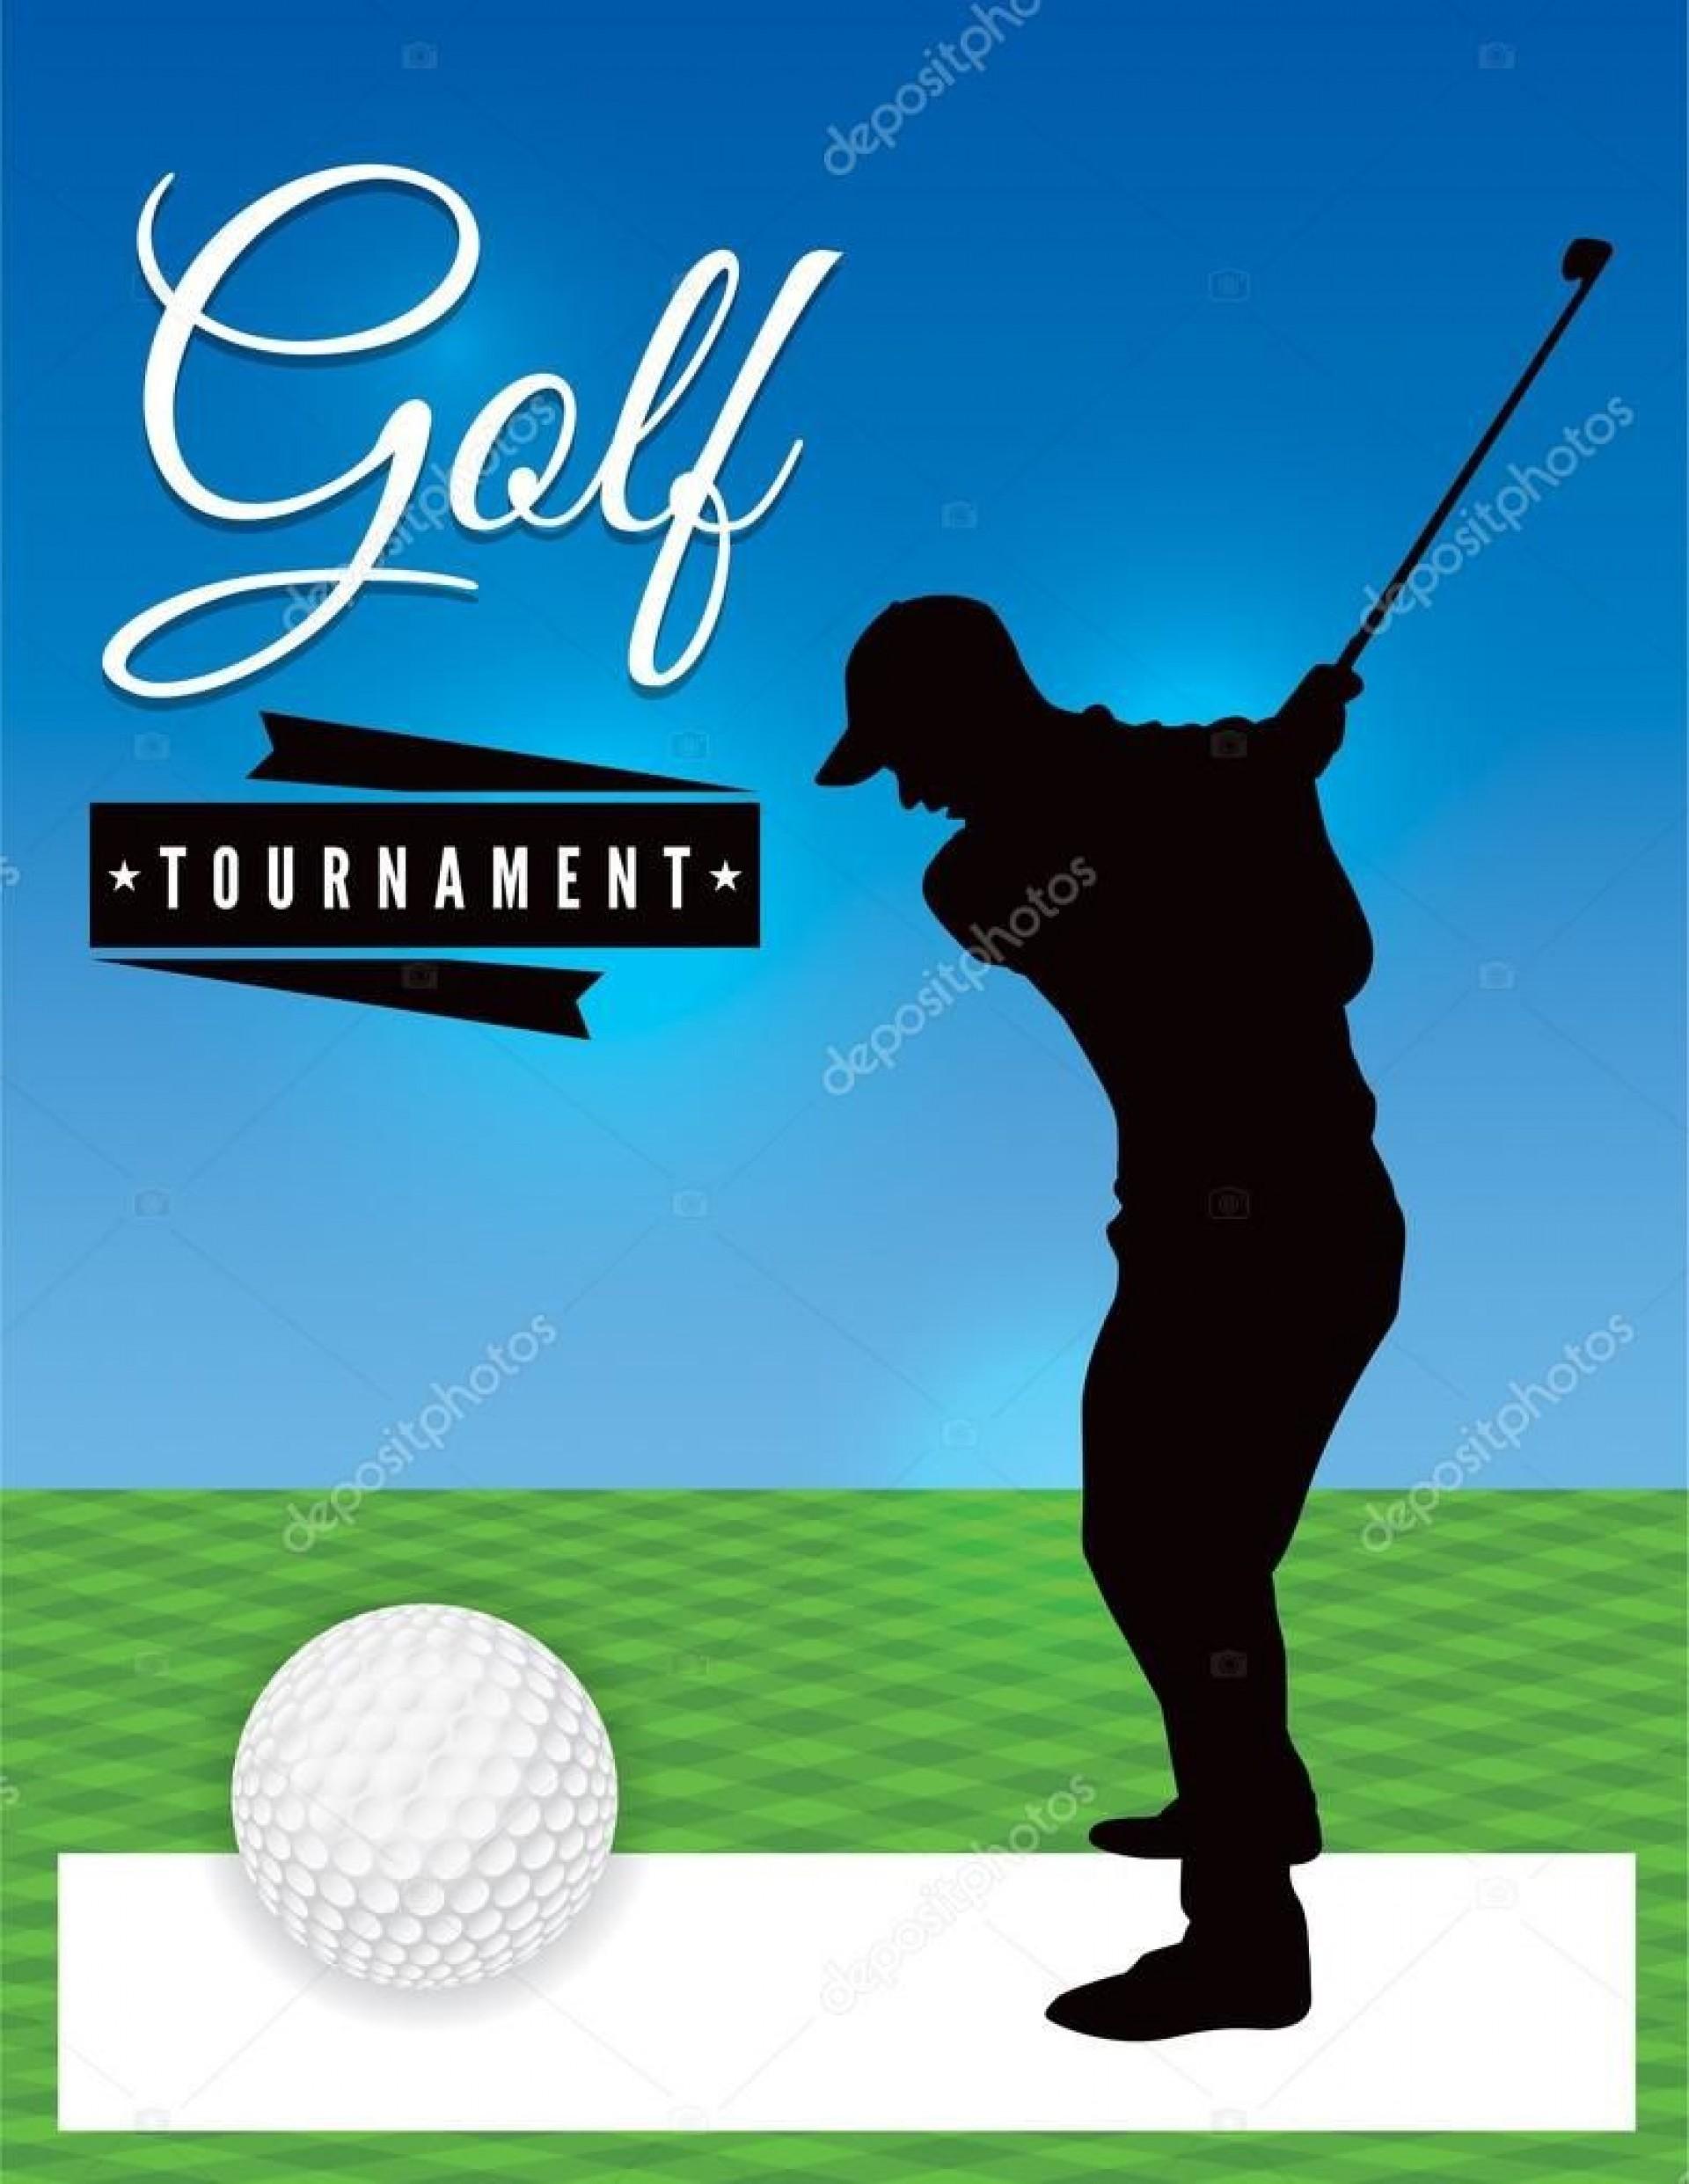 005 Stunning Free Charity Golf Tournament Flyer Template Design 1920